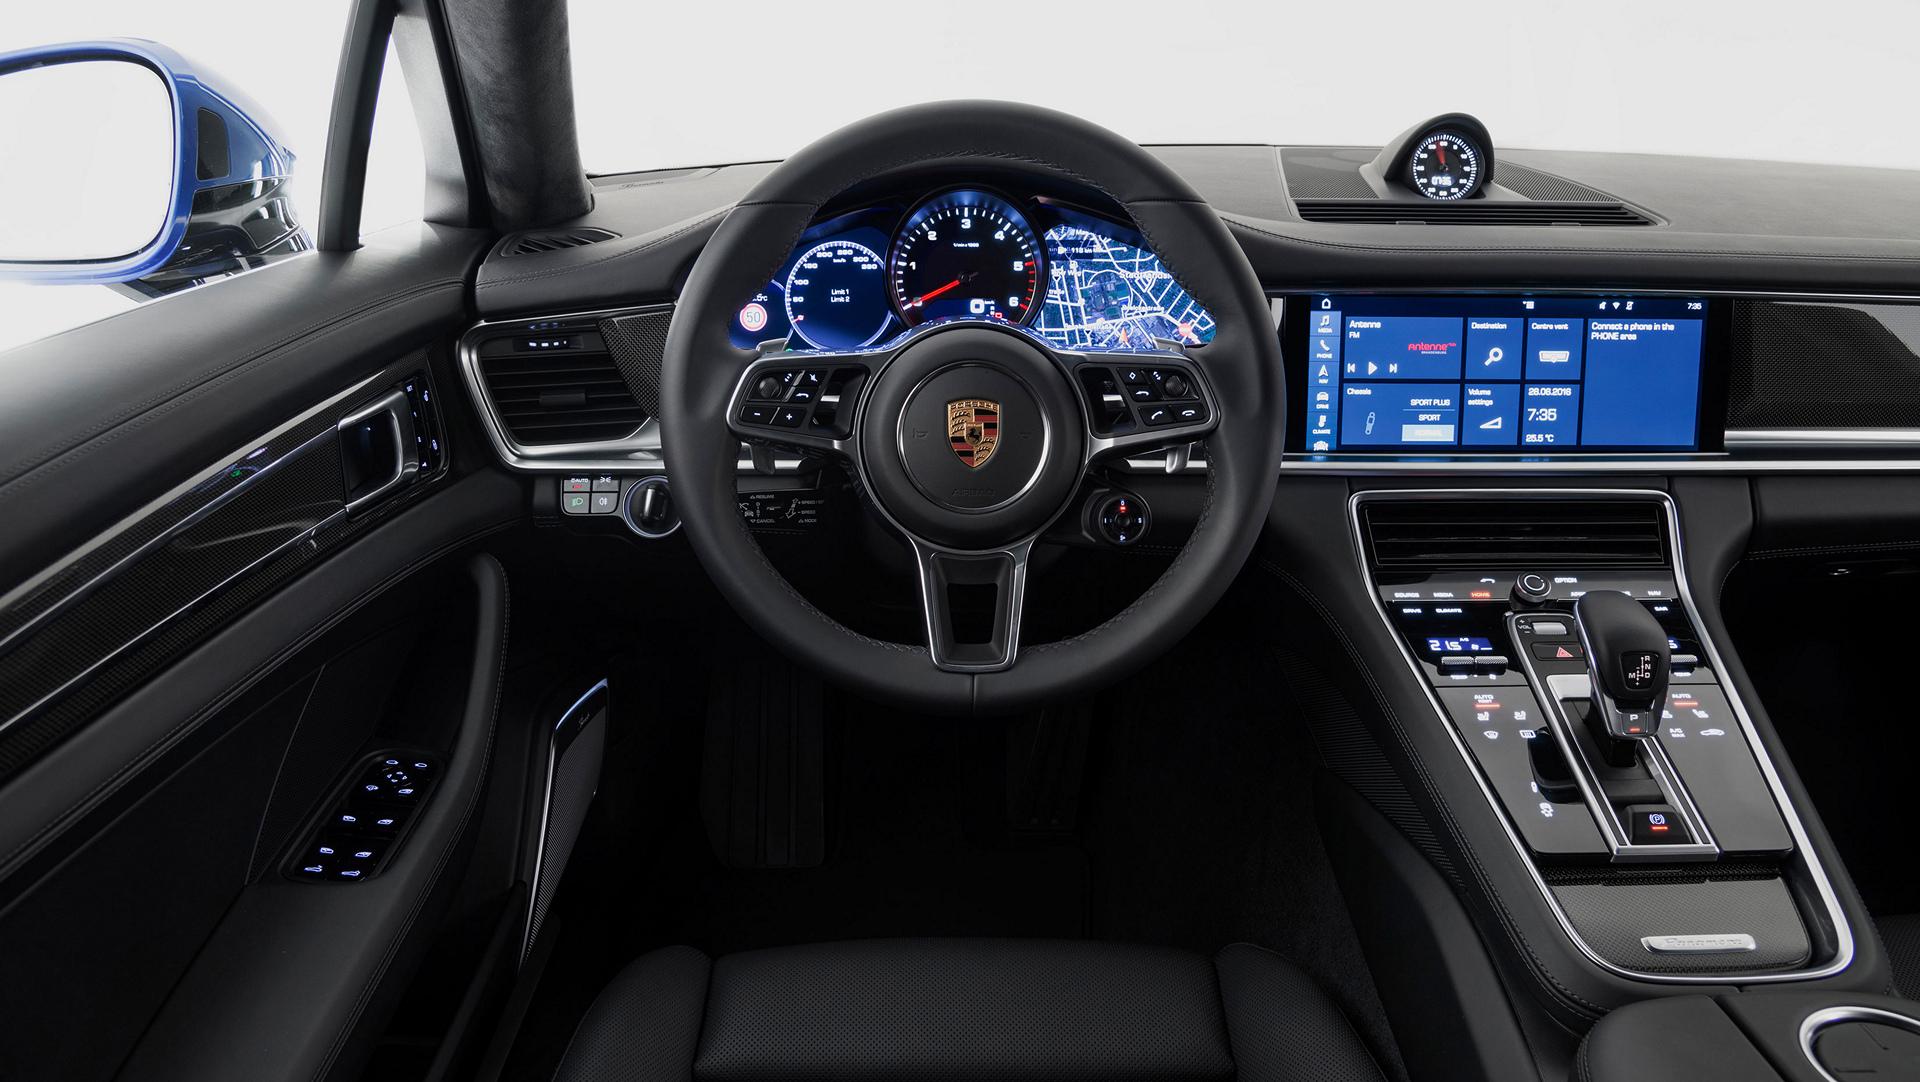 Panamera 4S © Dr. Ing. h.c. F. Porsche AG